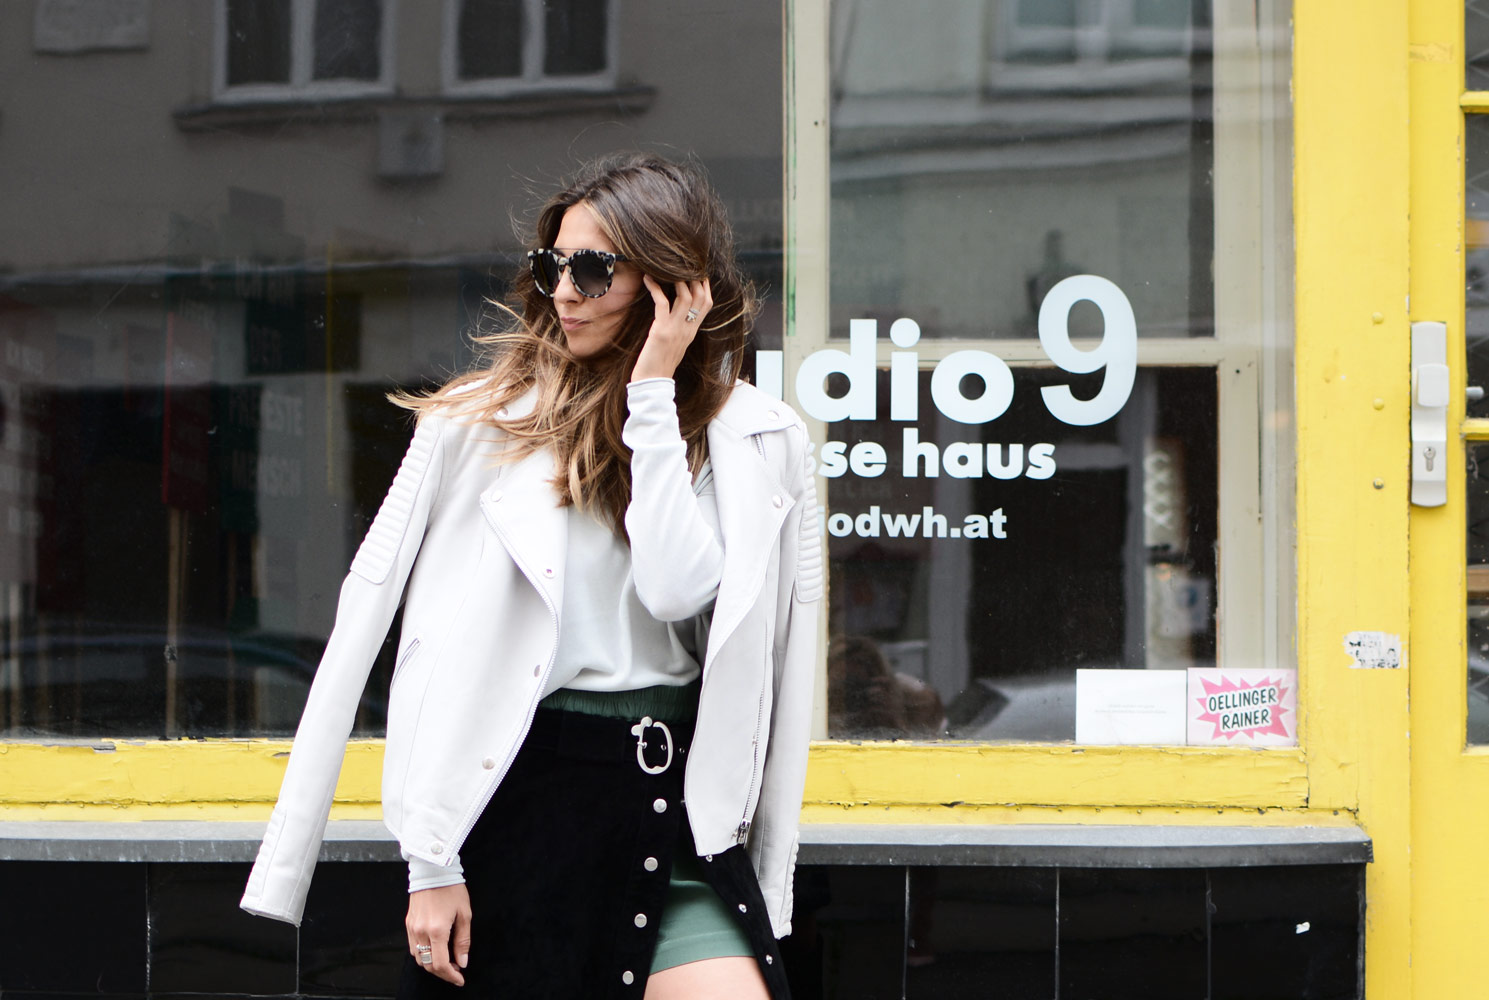 overknee Stiefel, madonna blogger award 2017, fashion